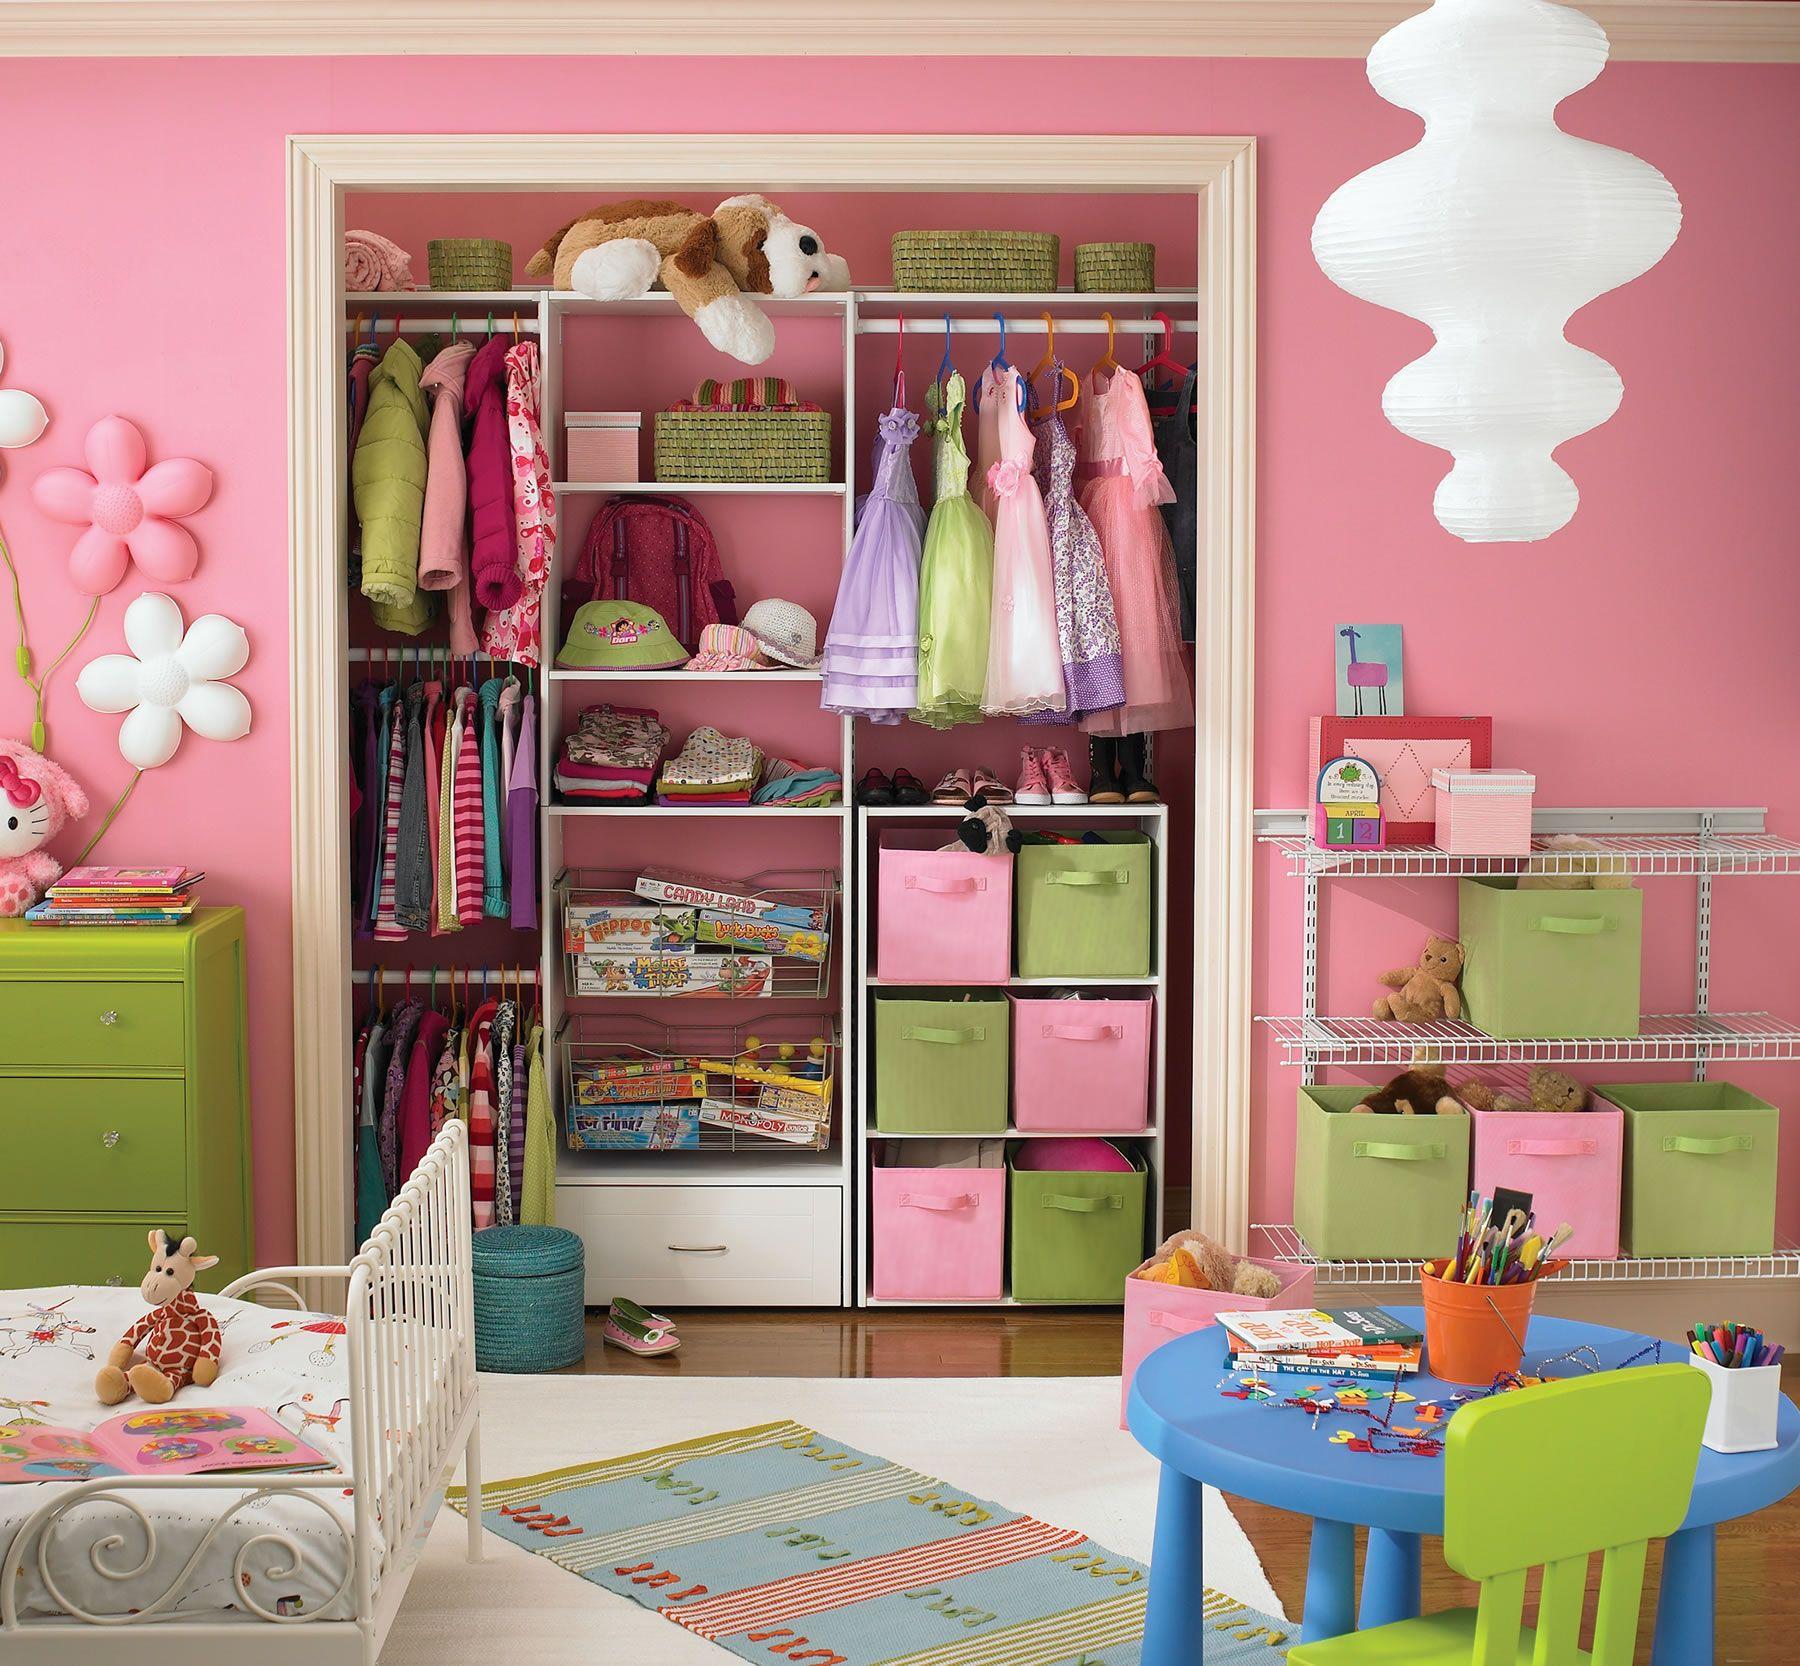 Kinda like the idea of no doors on the closet. Maybe curtains